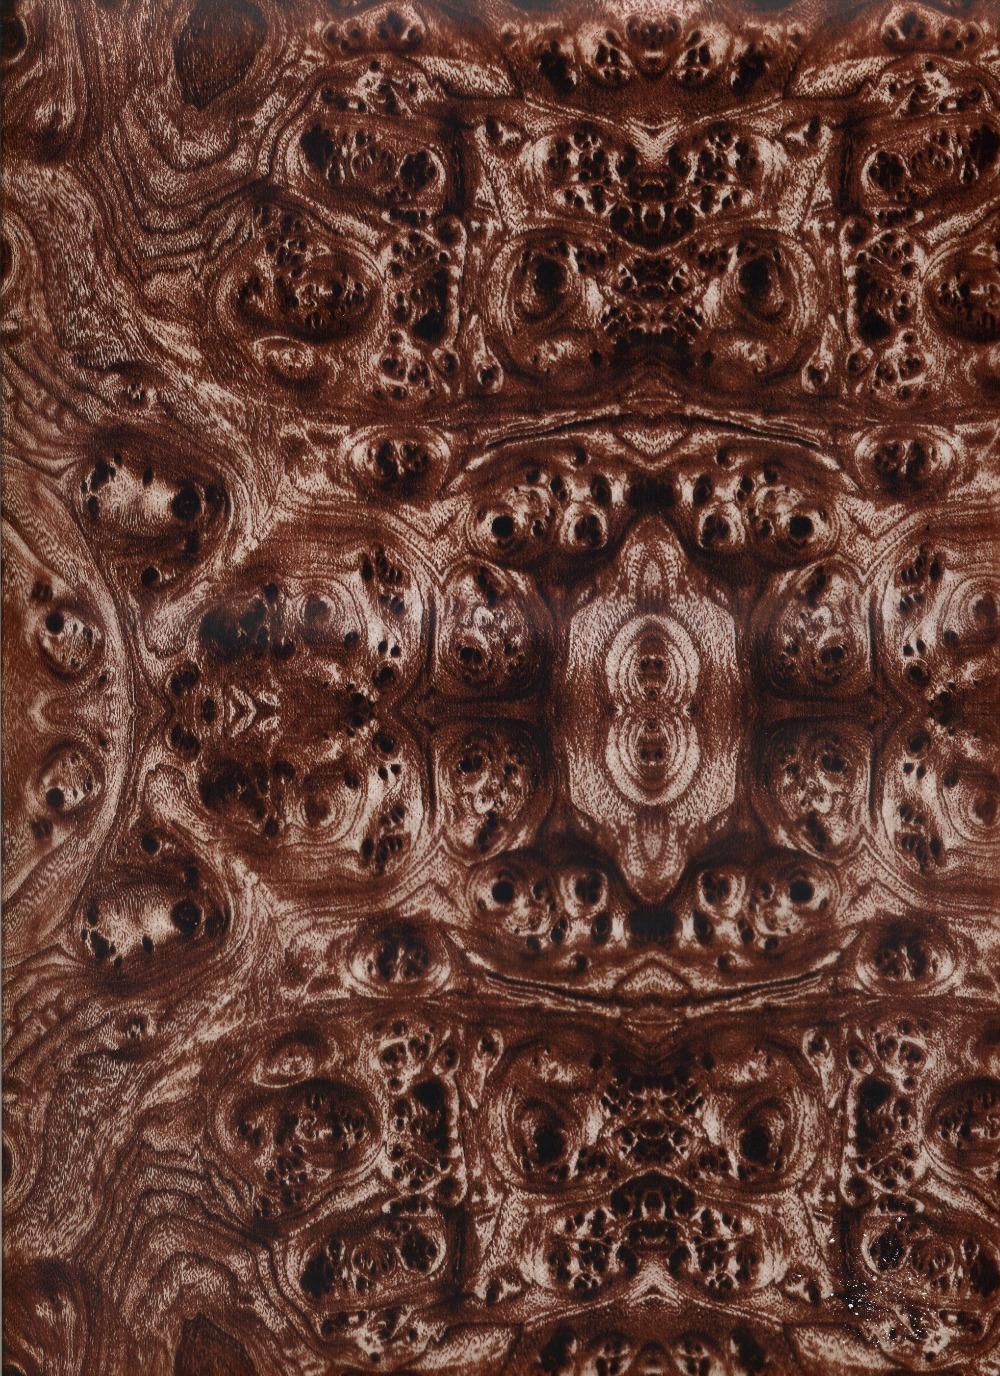 designed birdeye walnut burl wood grain Water tranfer Printing,M-215,Aqua Print for furniture,Lamp bases,Hydrographic FILM(China (Mainland))